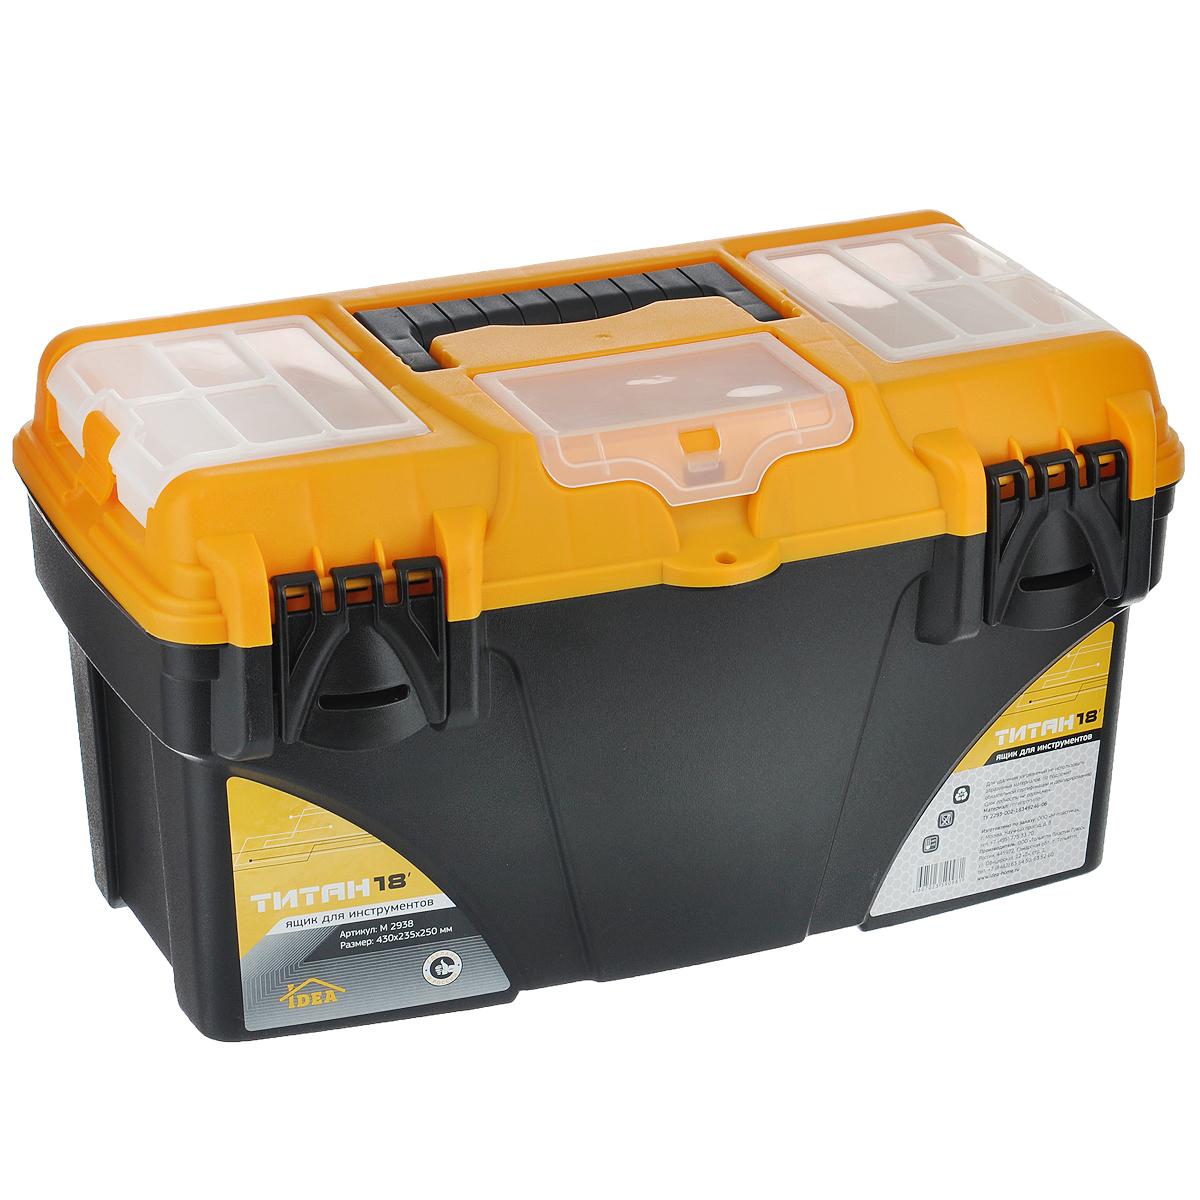 "Idea (М-пластика) Ящик для инструментов Idea ""Титан 18"", со съемным органайзером, 43 х 23,5 х 25 см"